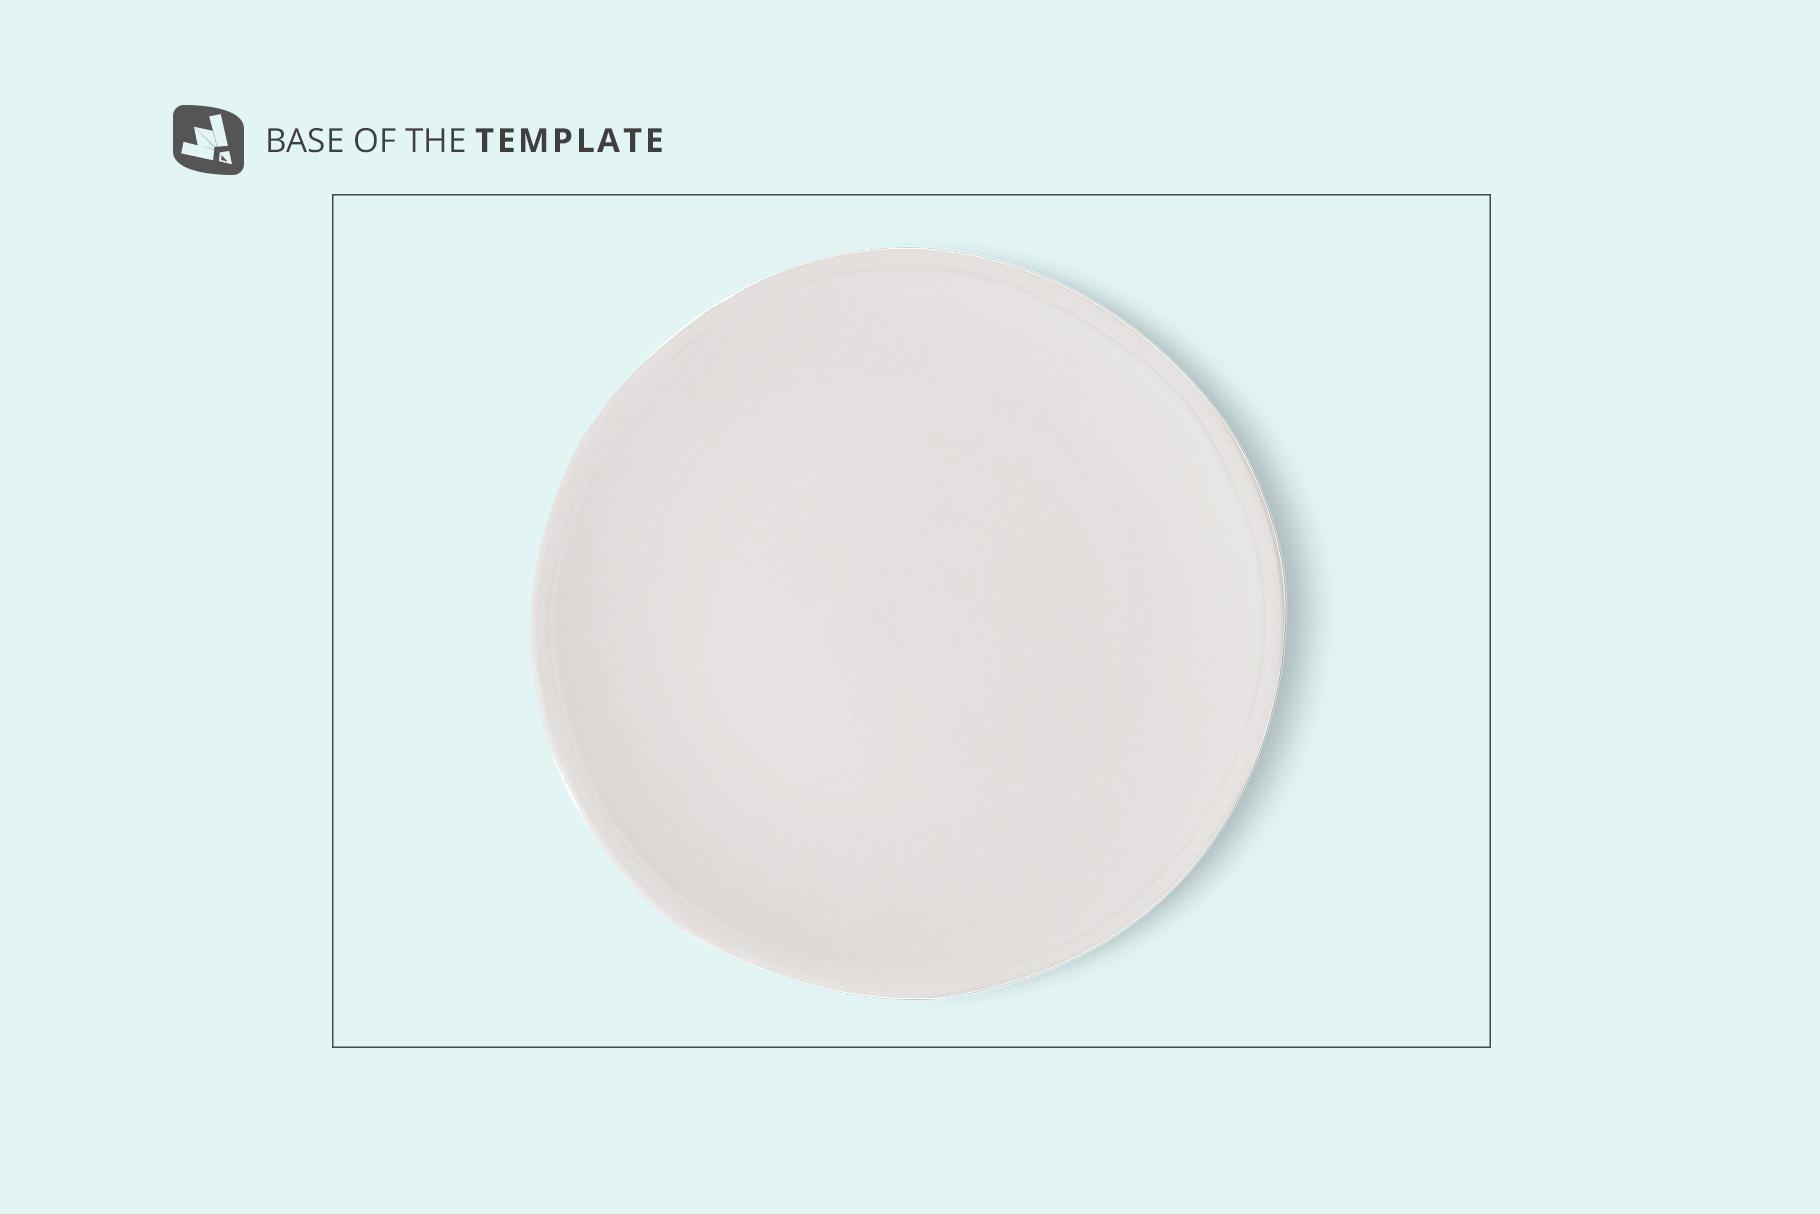 base image of the top view ceramic dish mockup